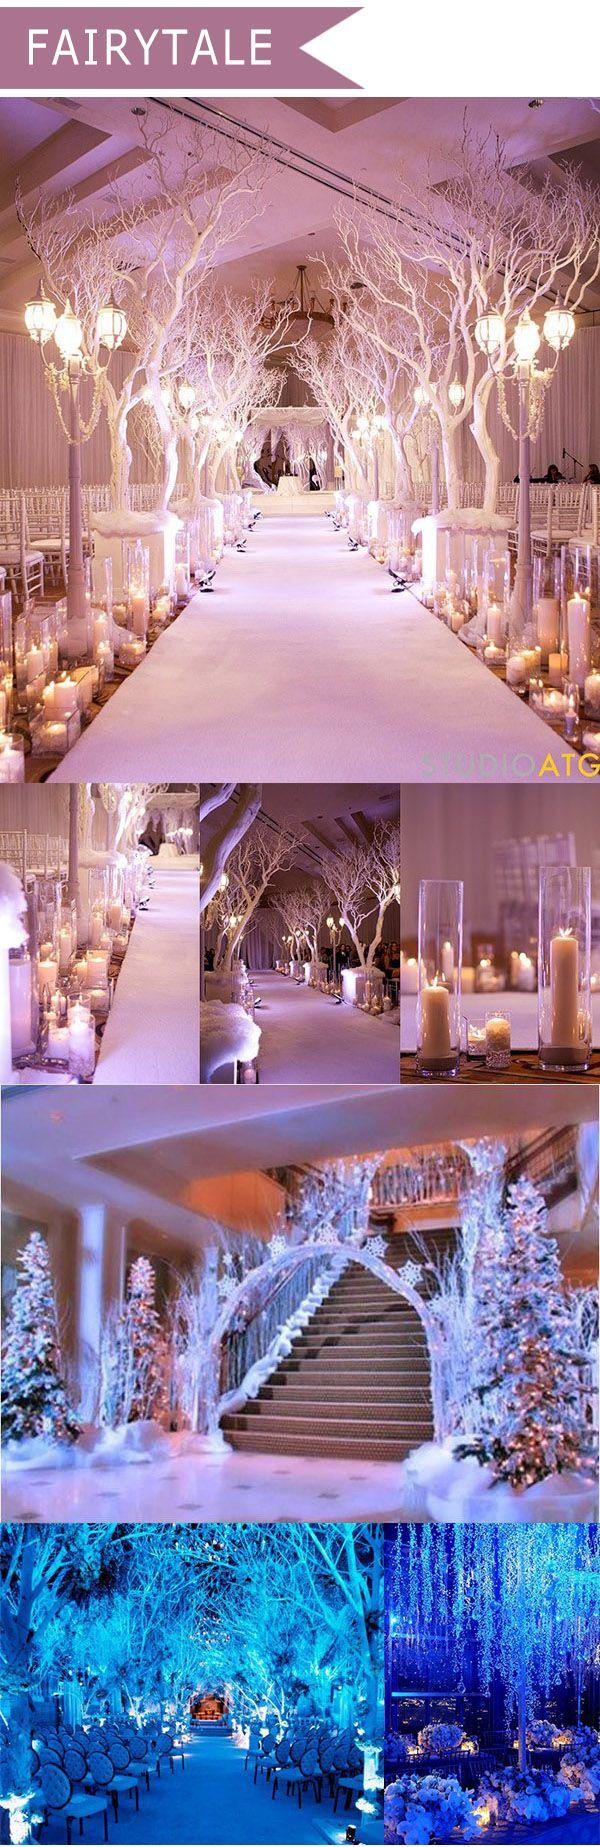 Wedding decorations white november 2018  best wedding decor images on Pinterest  Wedding ideas Wedding